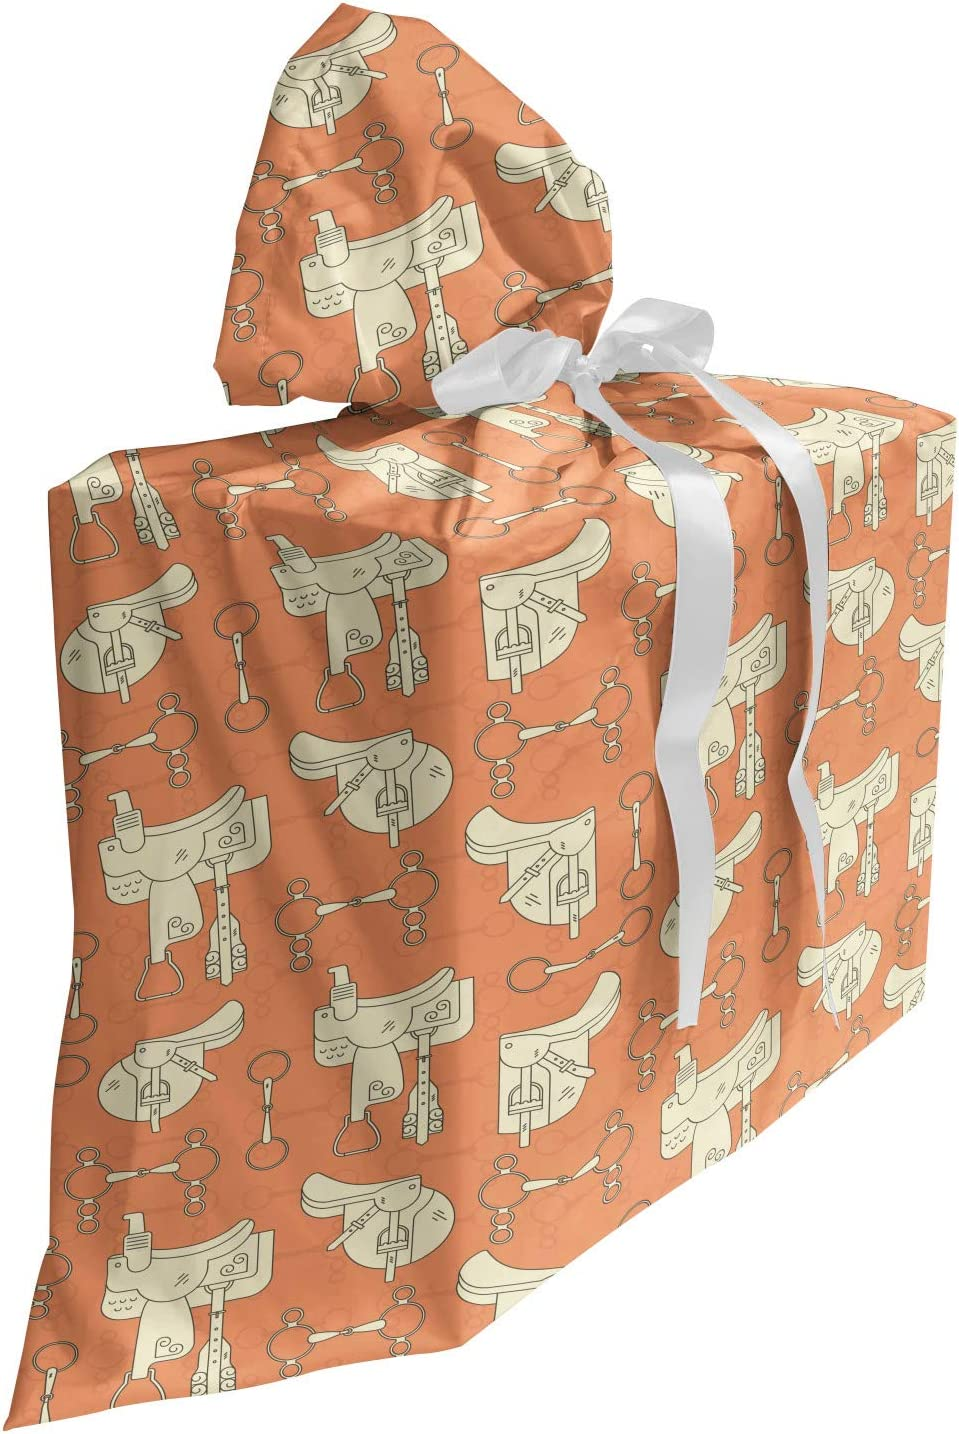 ABAKUHAUS Caballo Bolsa de Regalo para Baby Shower, Sillas de montar occidental Bits Elementos, Tela Estampada con 3 Moños Reutilizable, 70 cm x 80 cm, Melocotón oscuro y crema